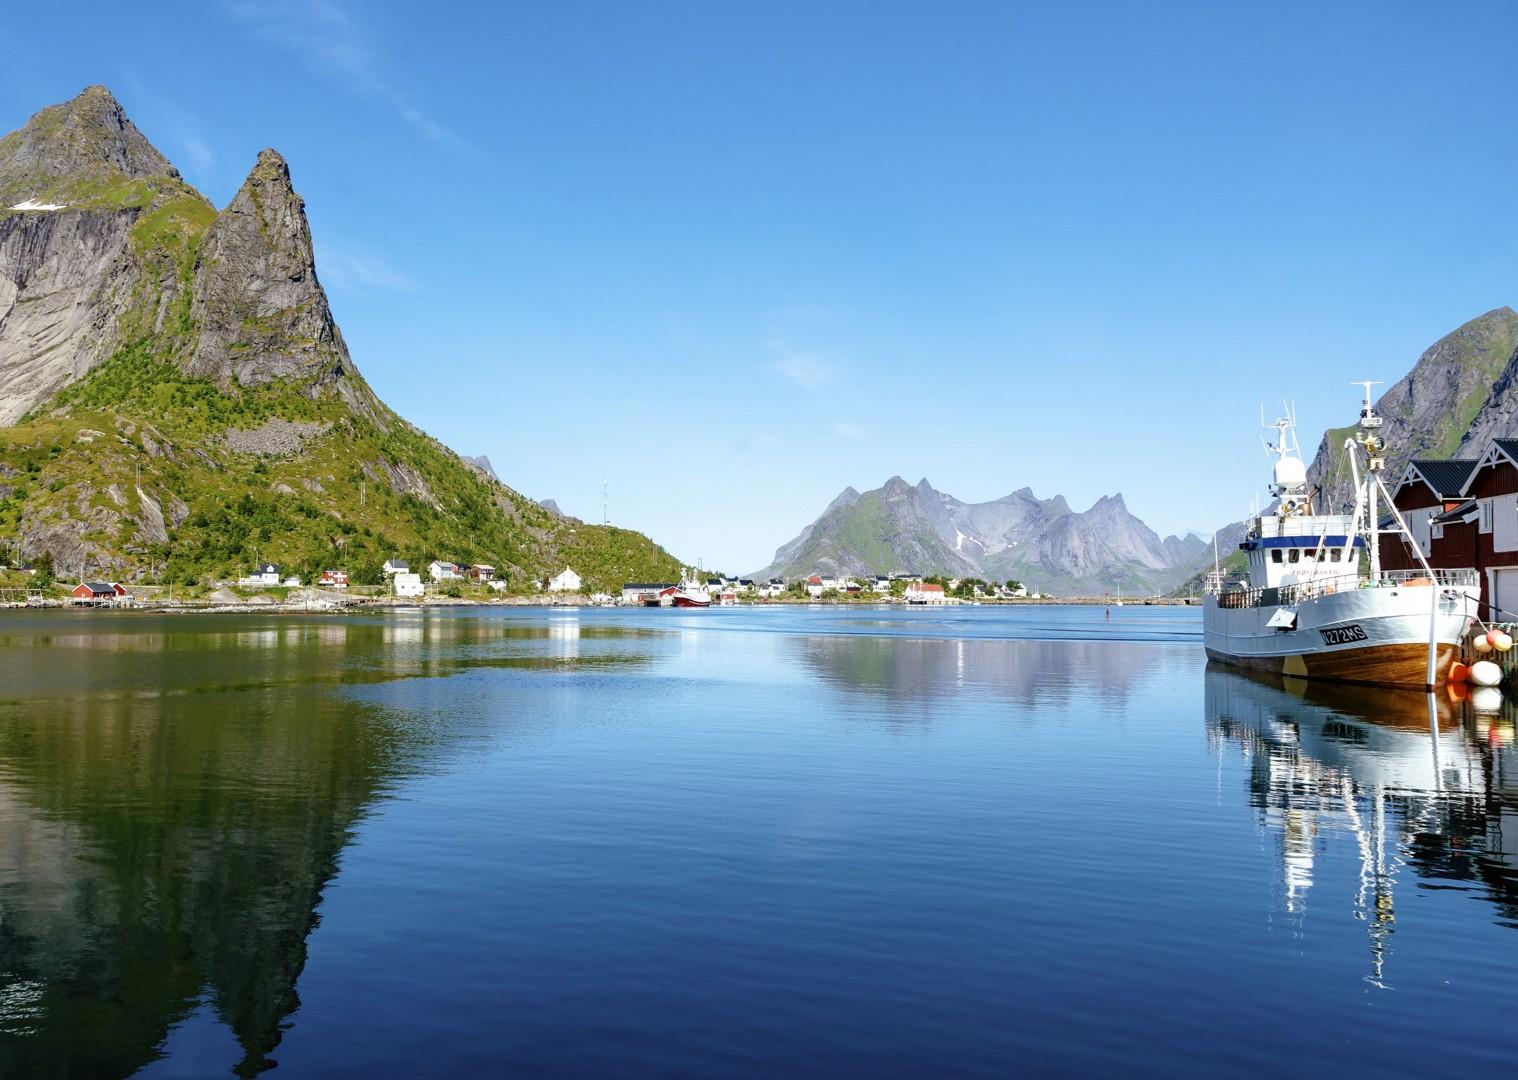 lesoure-cycling-holiday-lofoten-landscape.jpg - Norway - Lofoten Islands - Self-Guided Leisure Cycling Holiday - Leisure Cycling